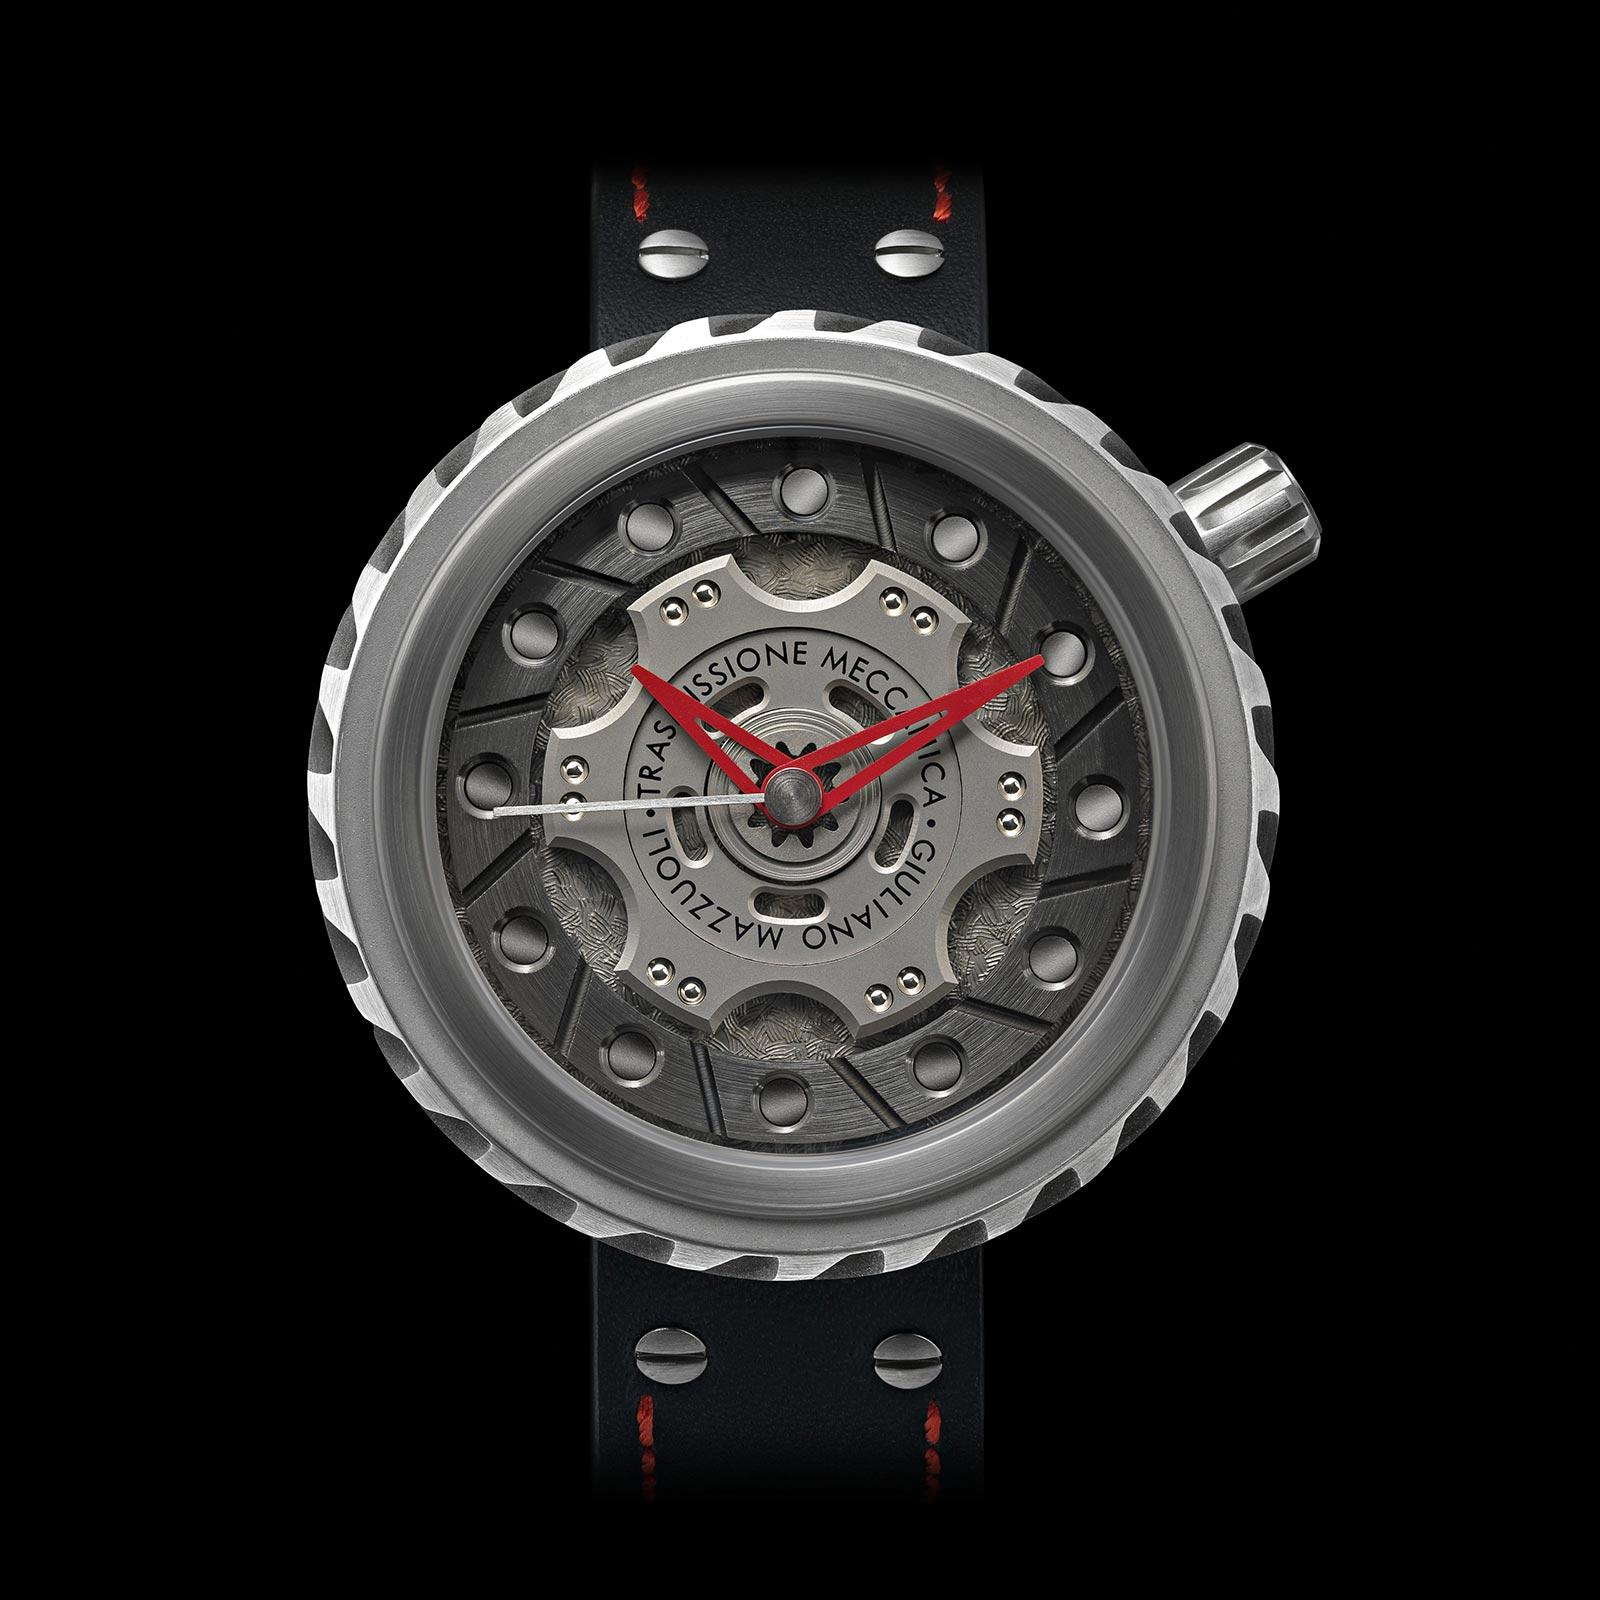 Trasmissione meccanica watch front